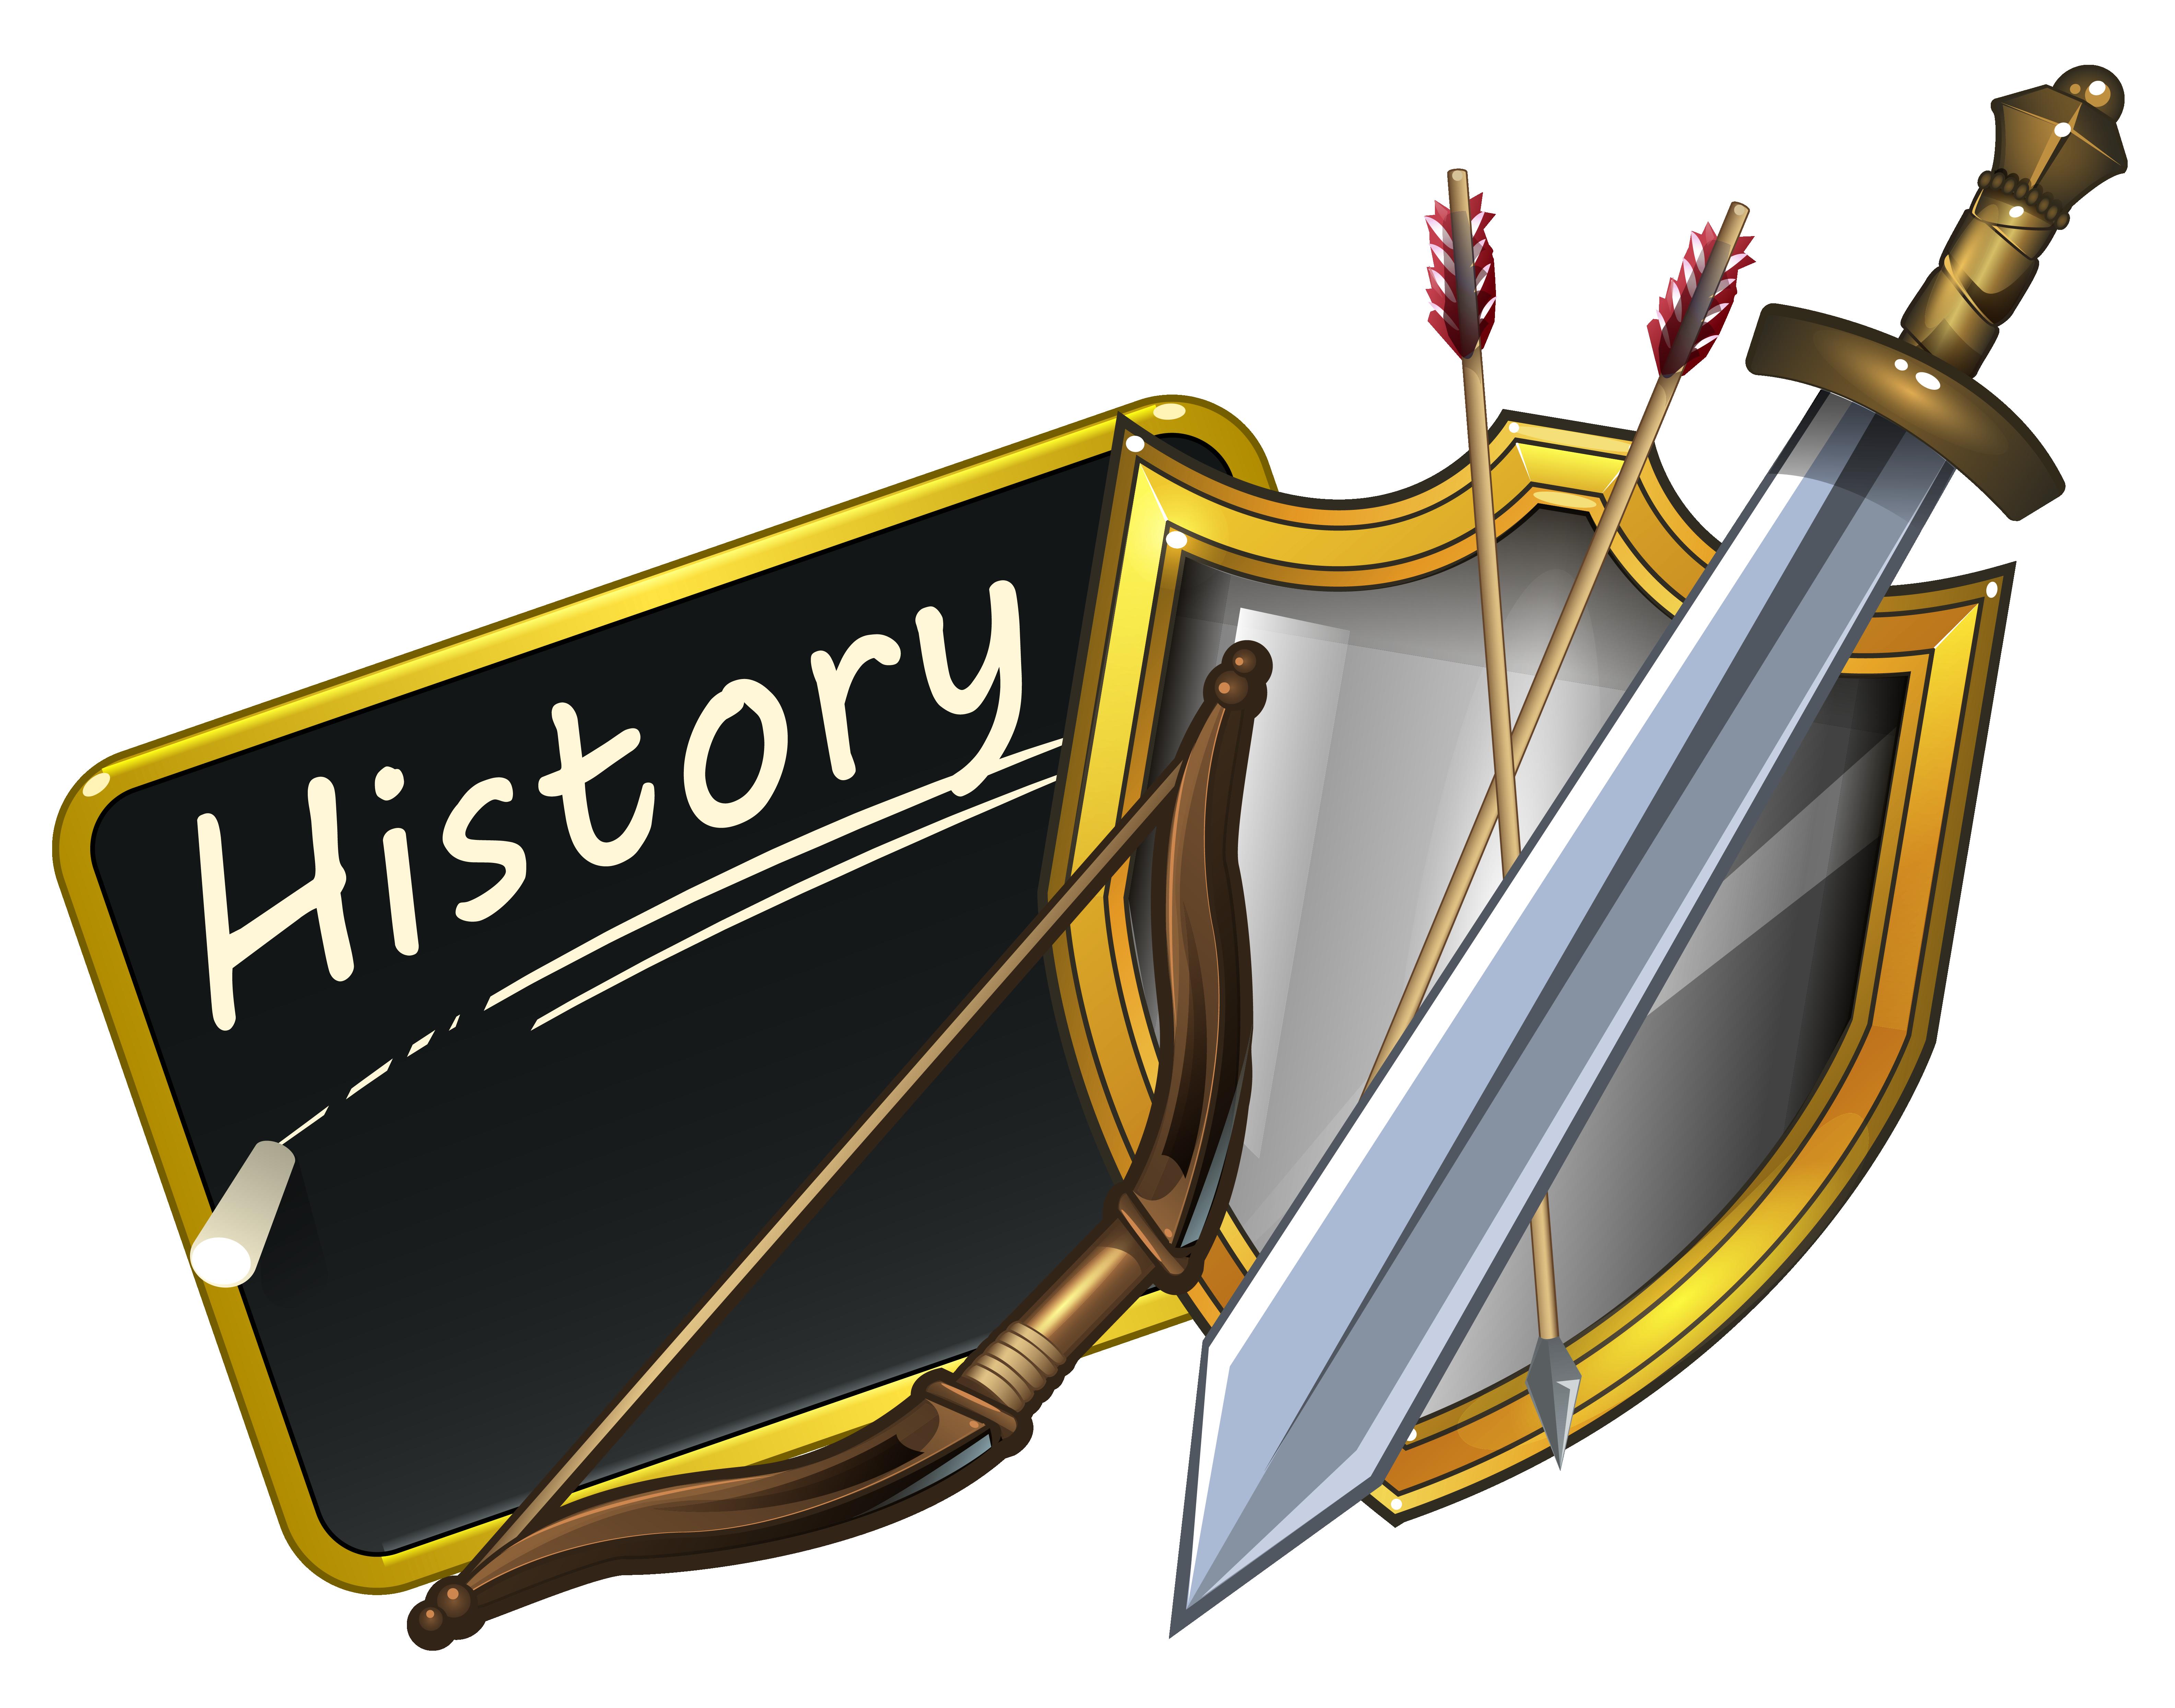 6339x4978 History Book Cliparts